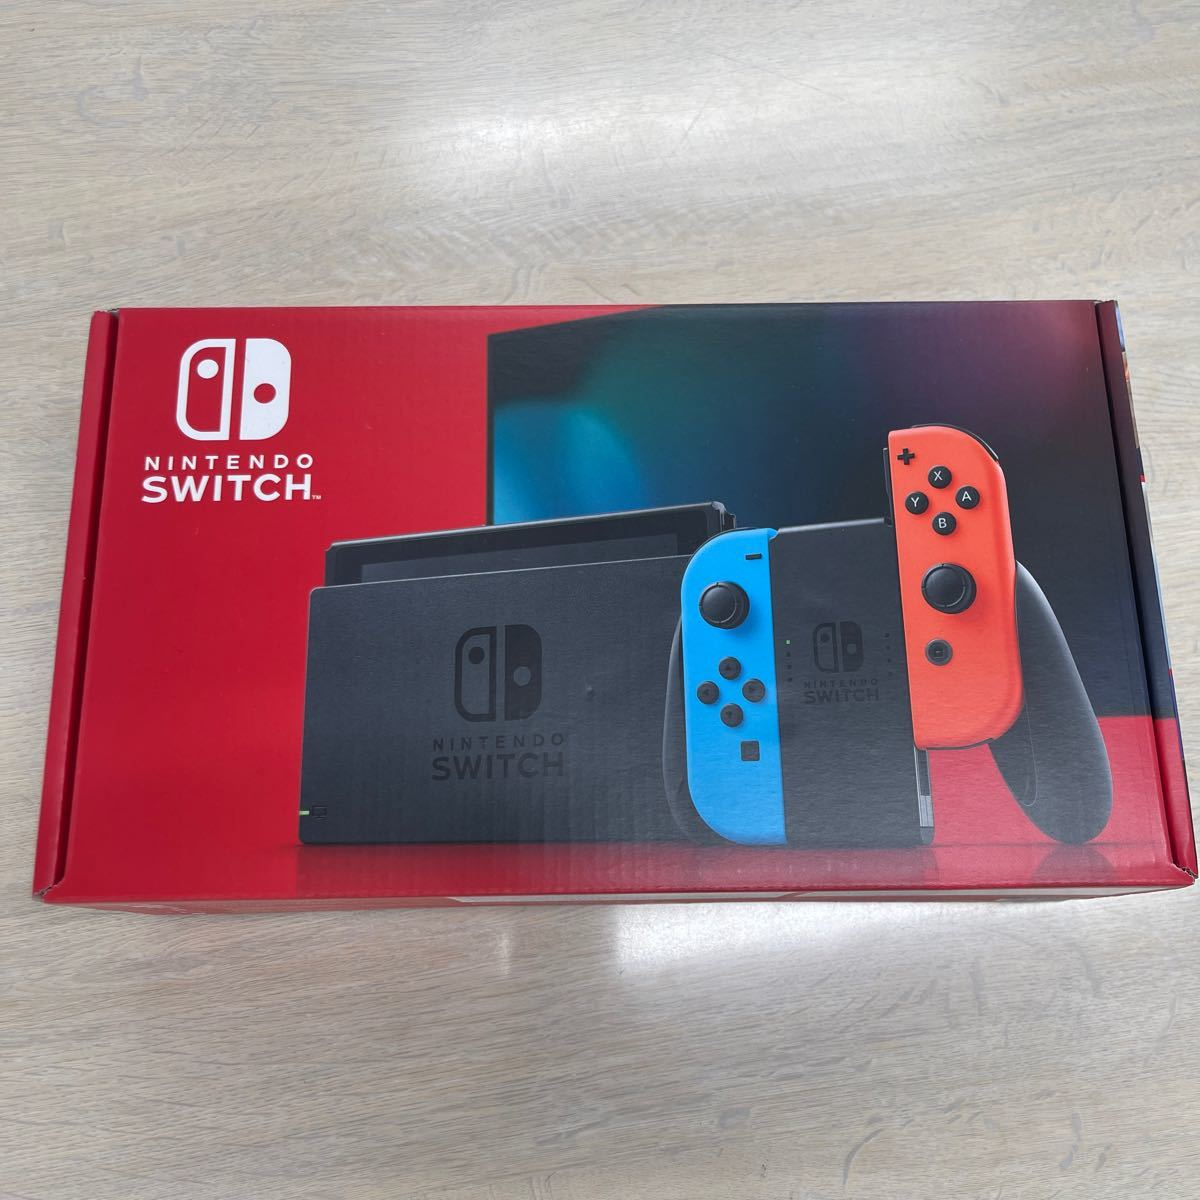 Nintendo Switch Switch本体 新品未使用 新型 Nintendo Switch ニンテンドースイッチ 本体